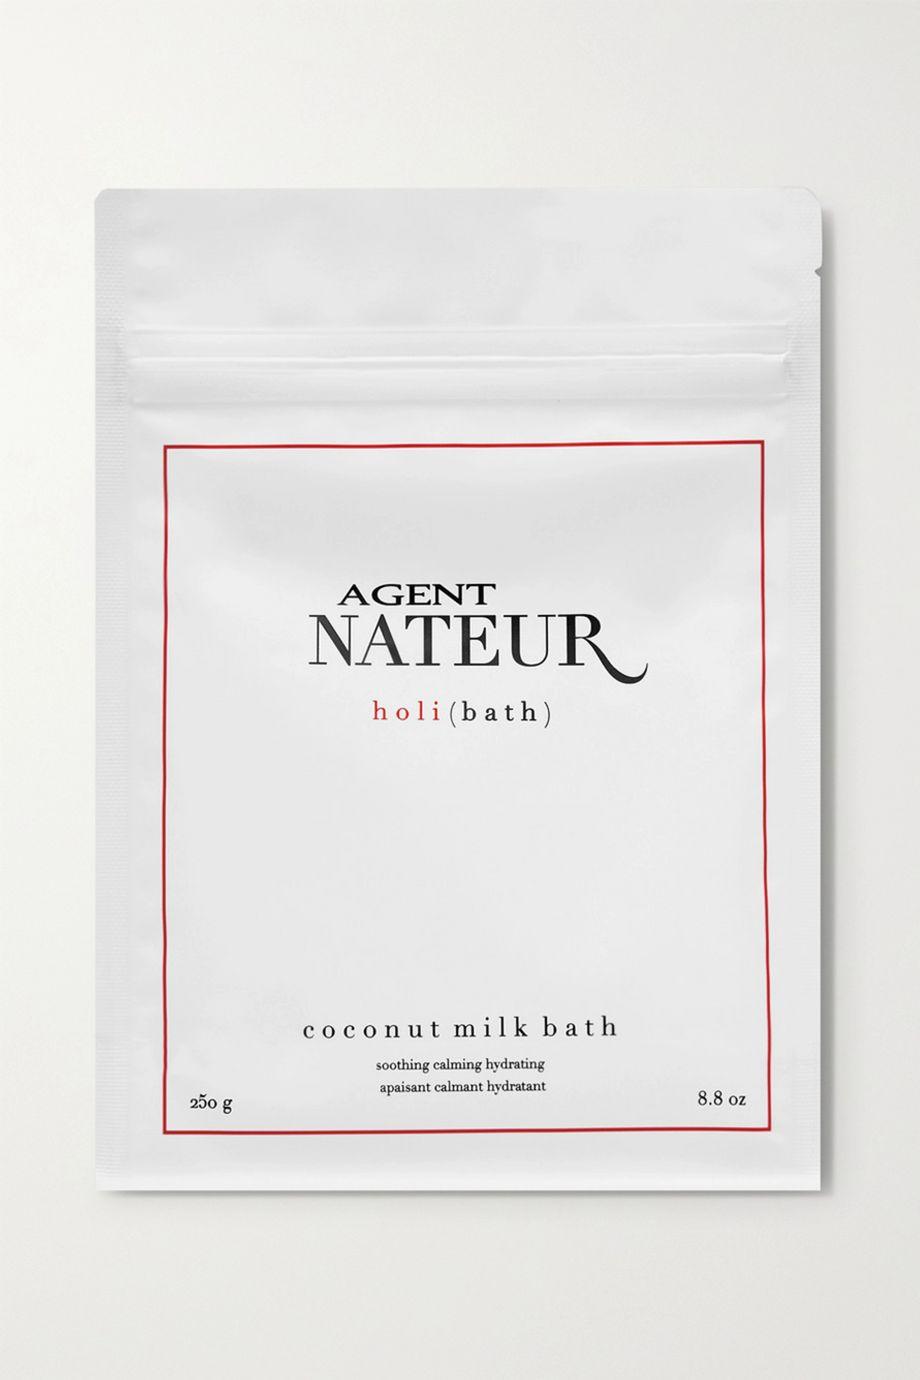 Agent Nateur holi(bath) Soak, 250g